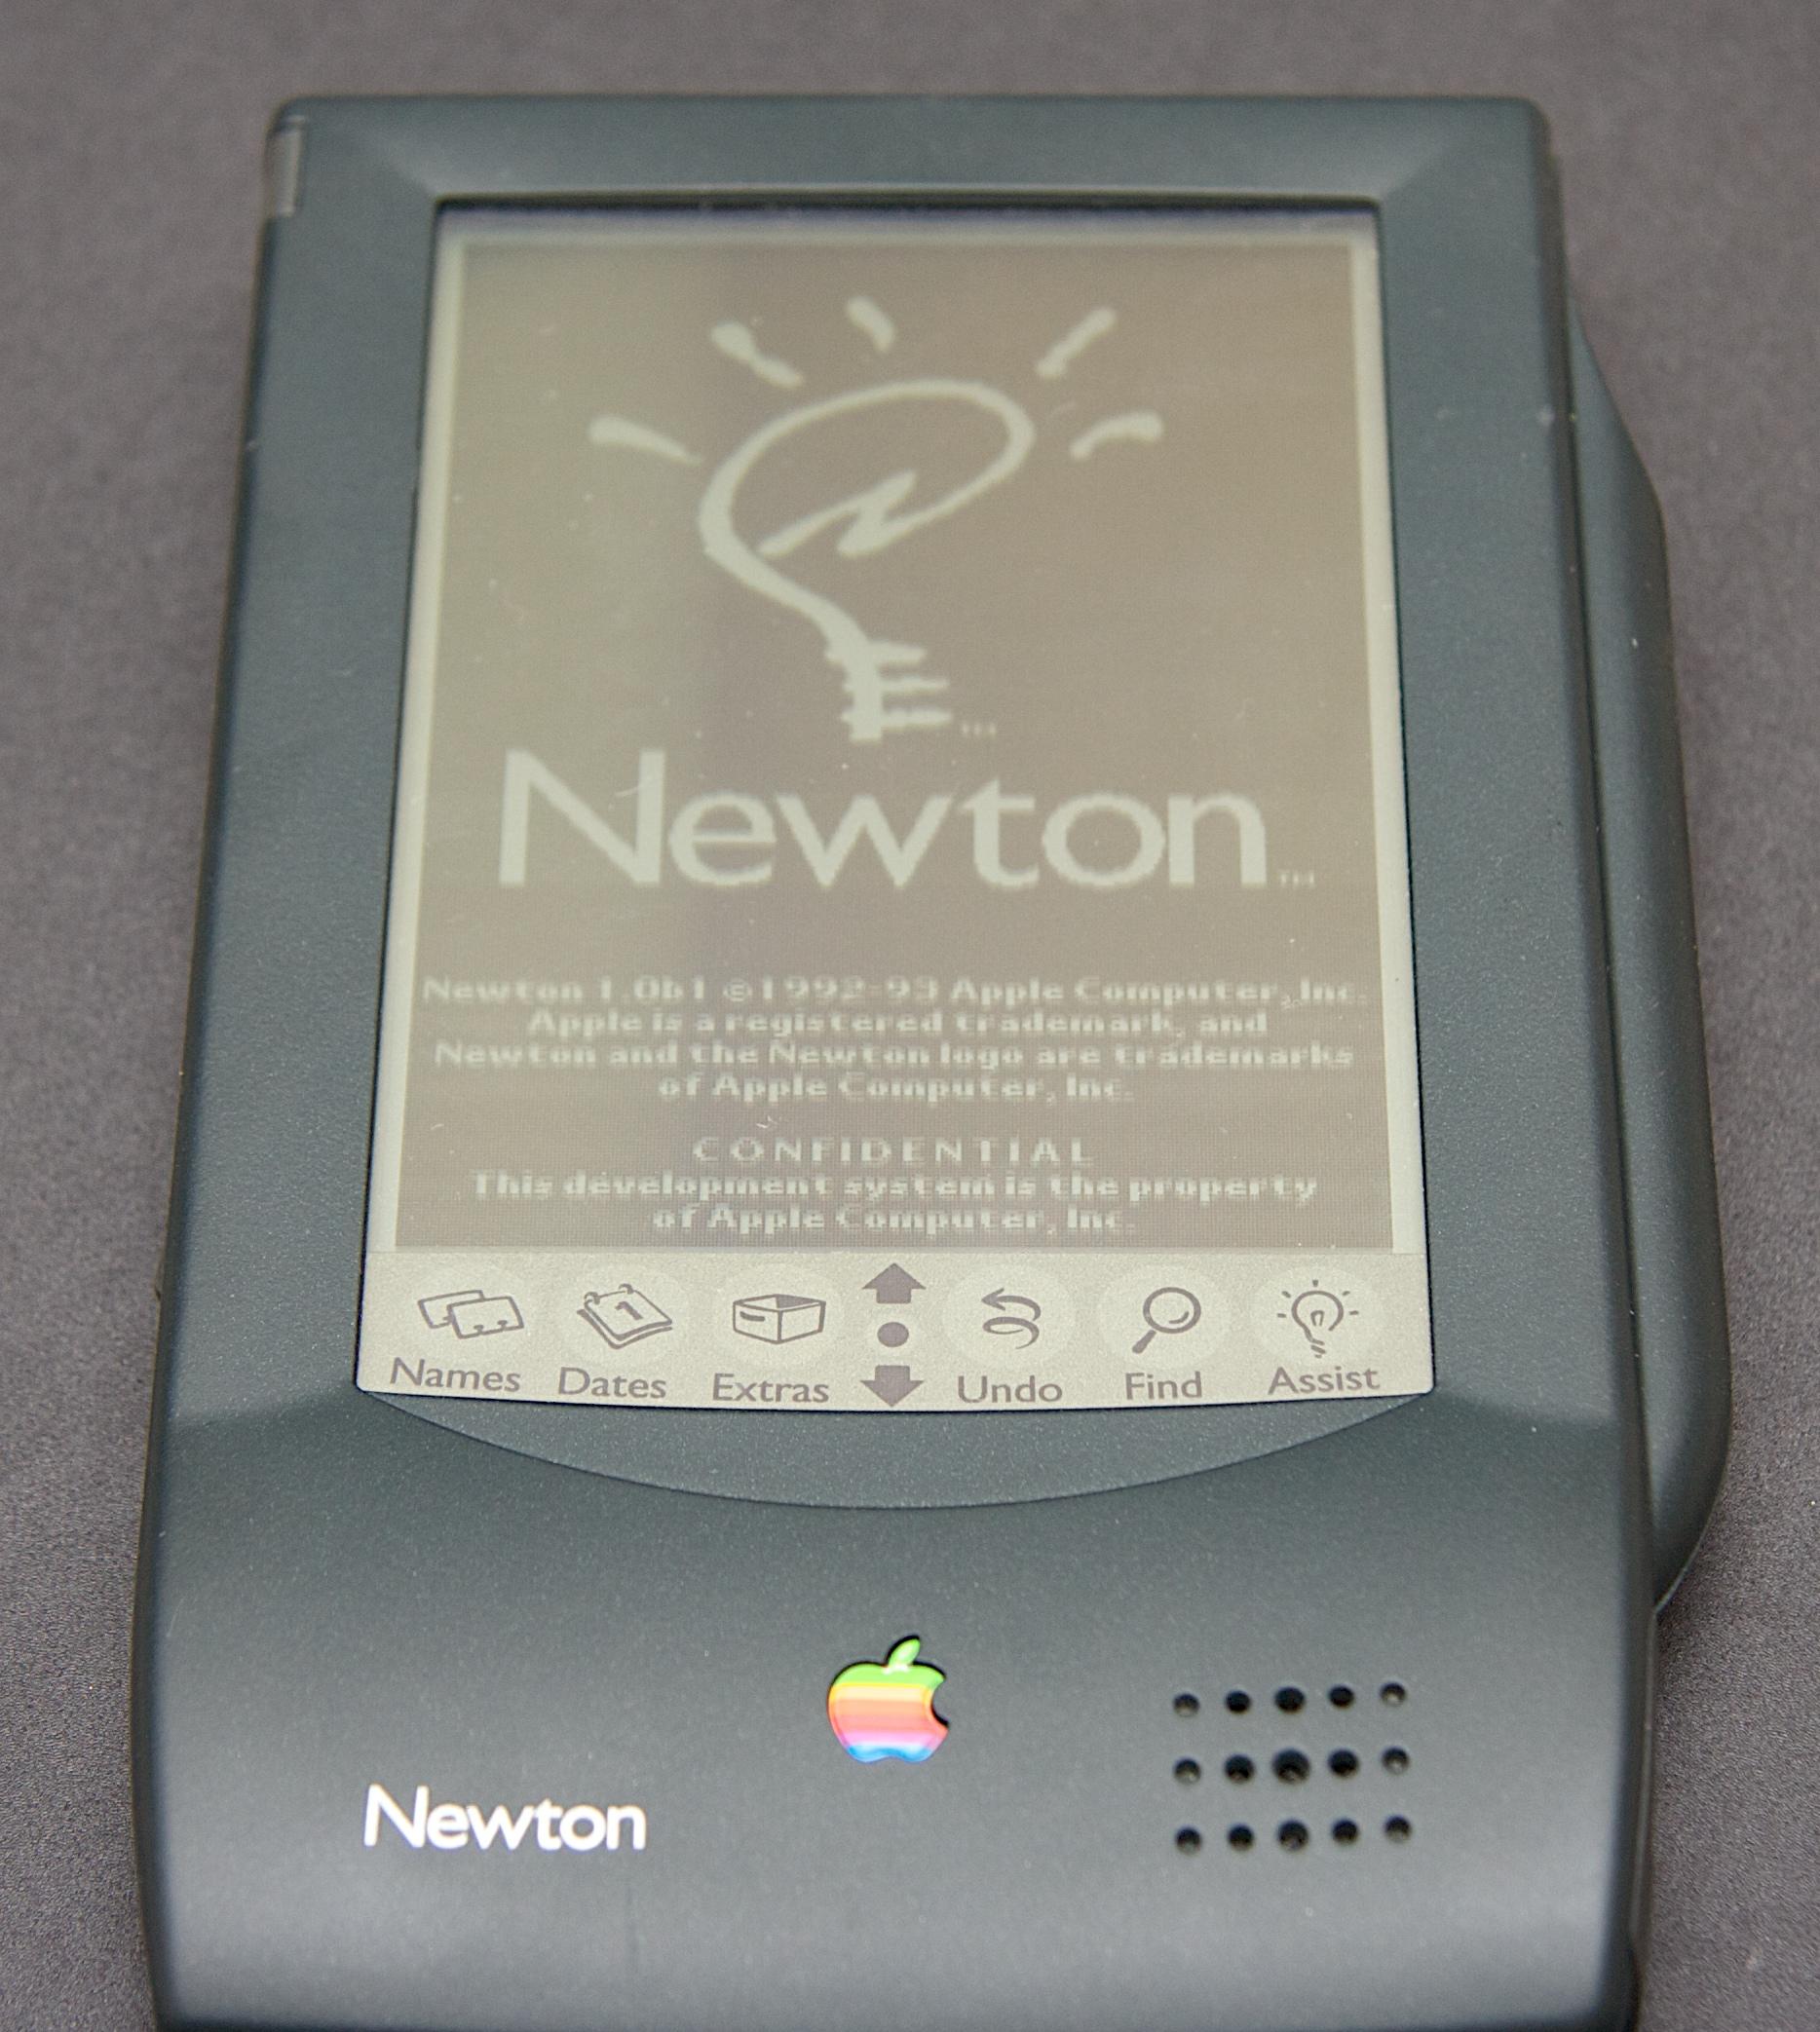 https://i0.wp.com/popularlogistics.com/wp-content/uploads/2010/08/apple-newton-power-on.jpg